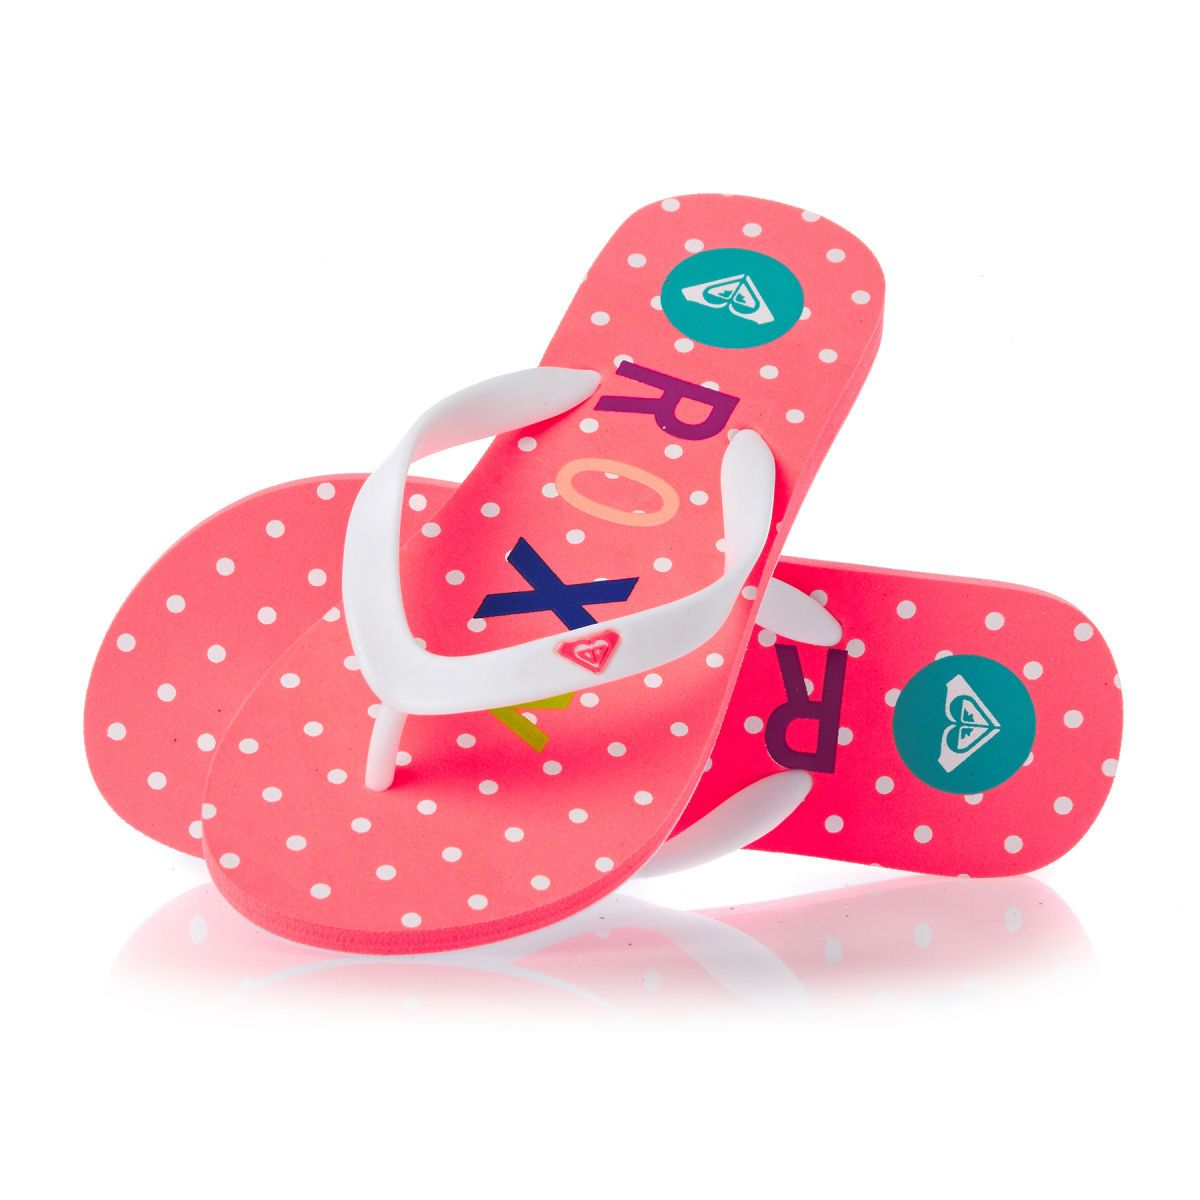 e5d993c9532 Roxy Tahiti Flip Flops - Pink Carnation